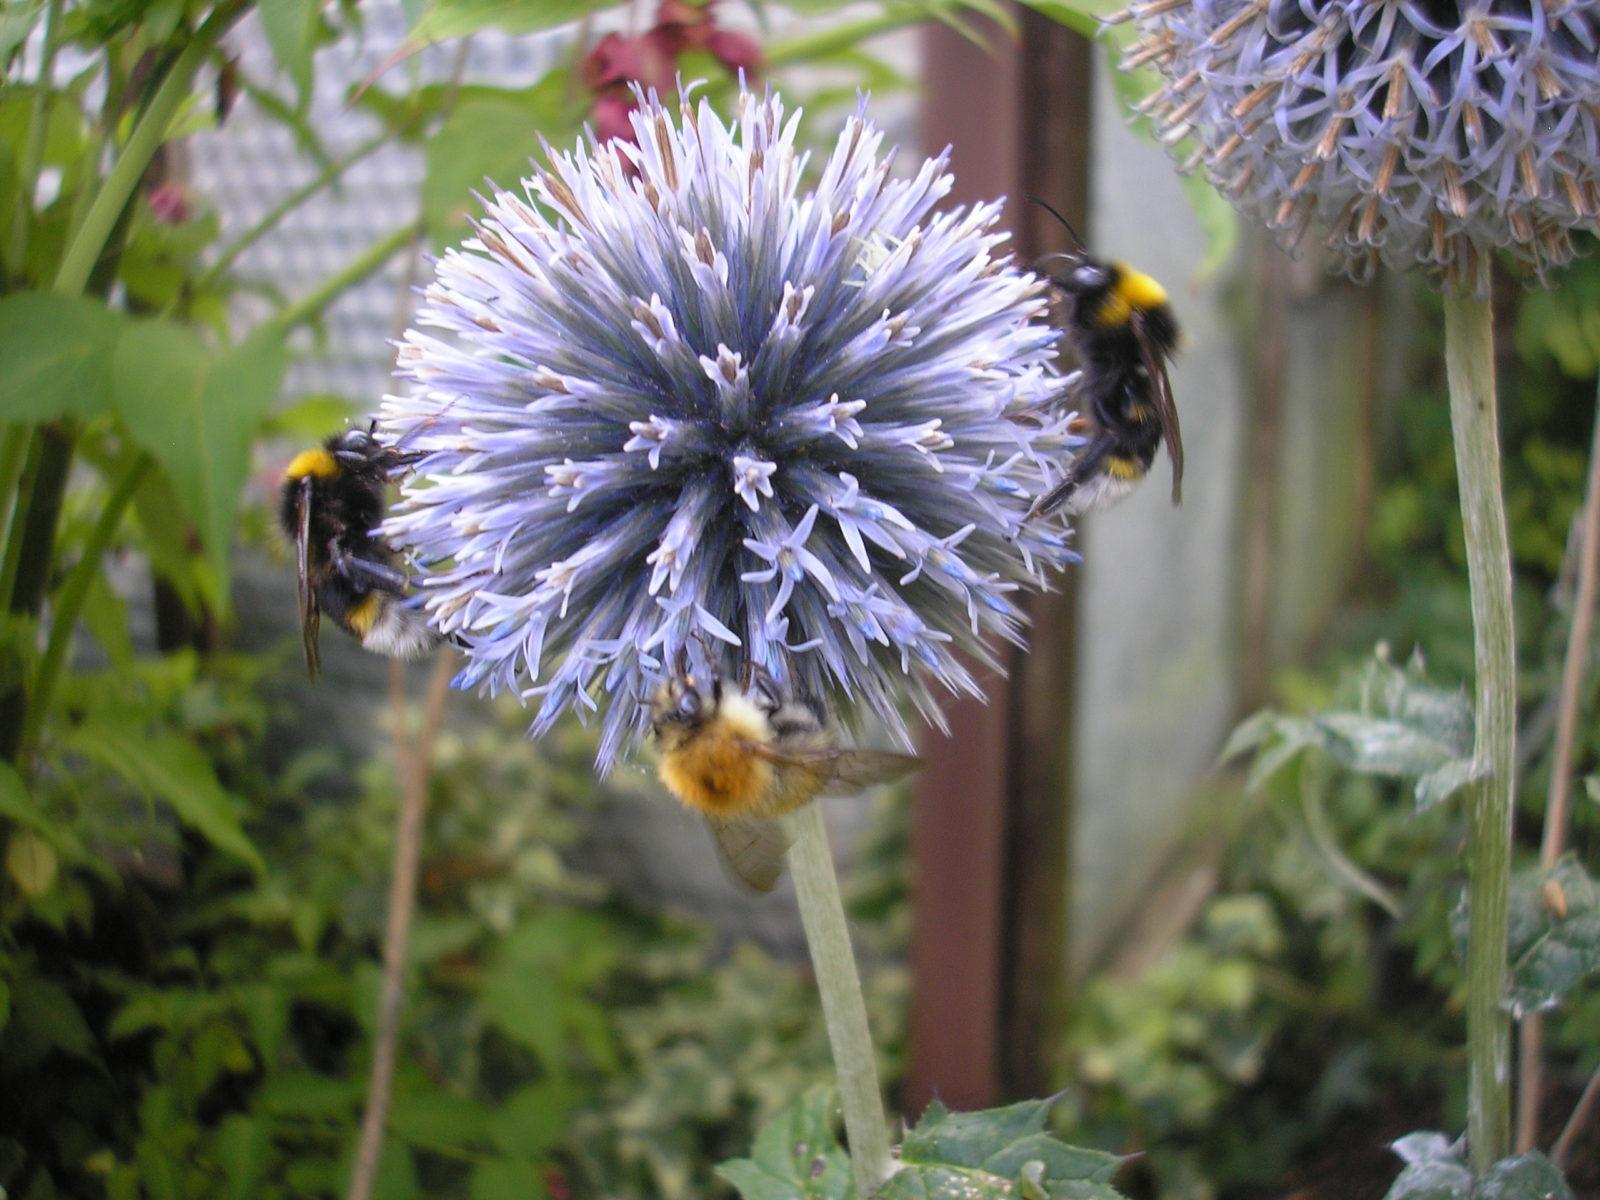 Bees feeding on Echinops ritro Taplow Blue